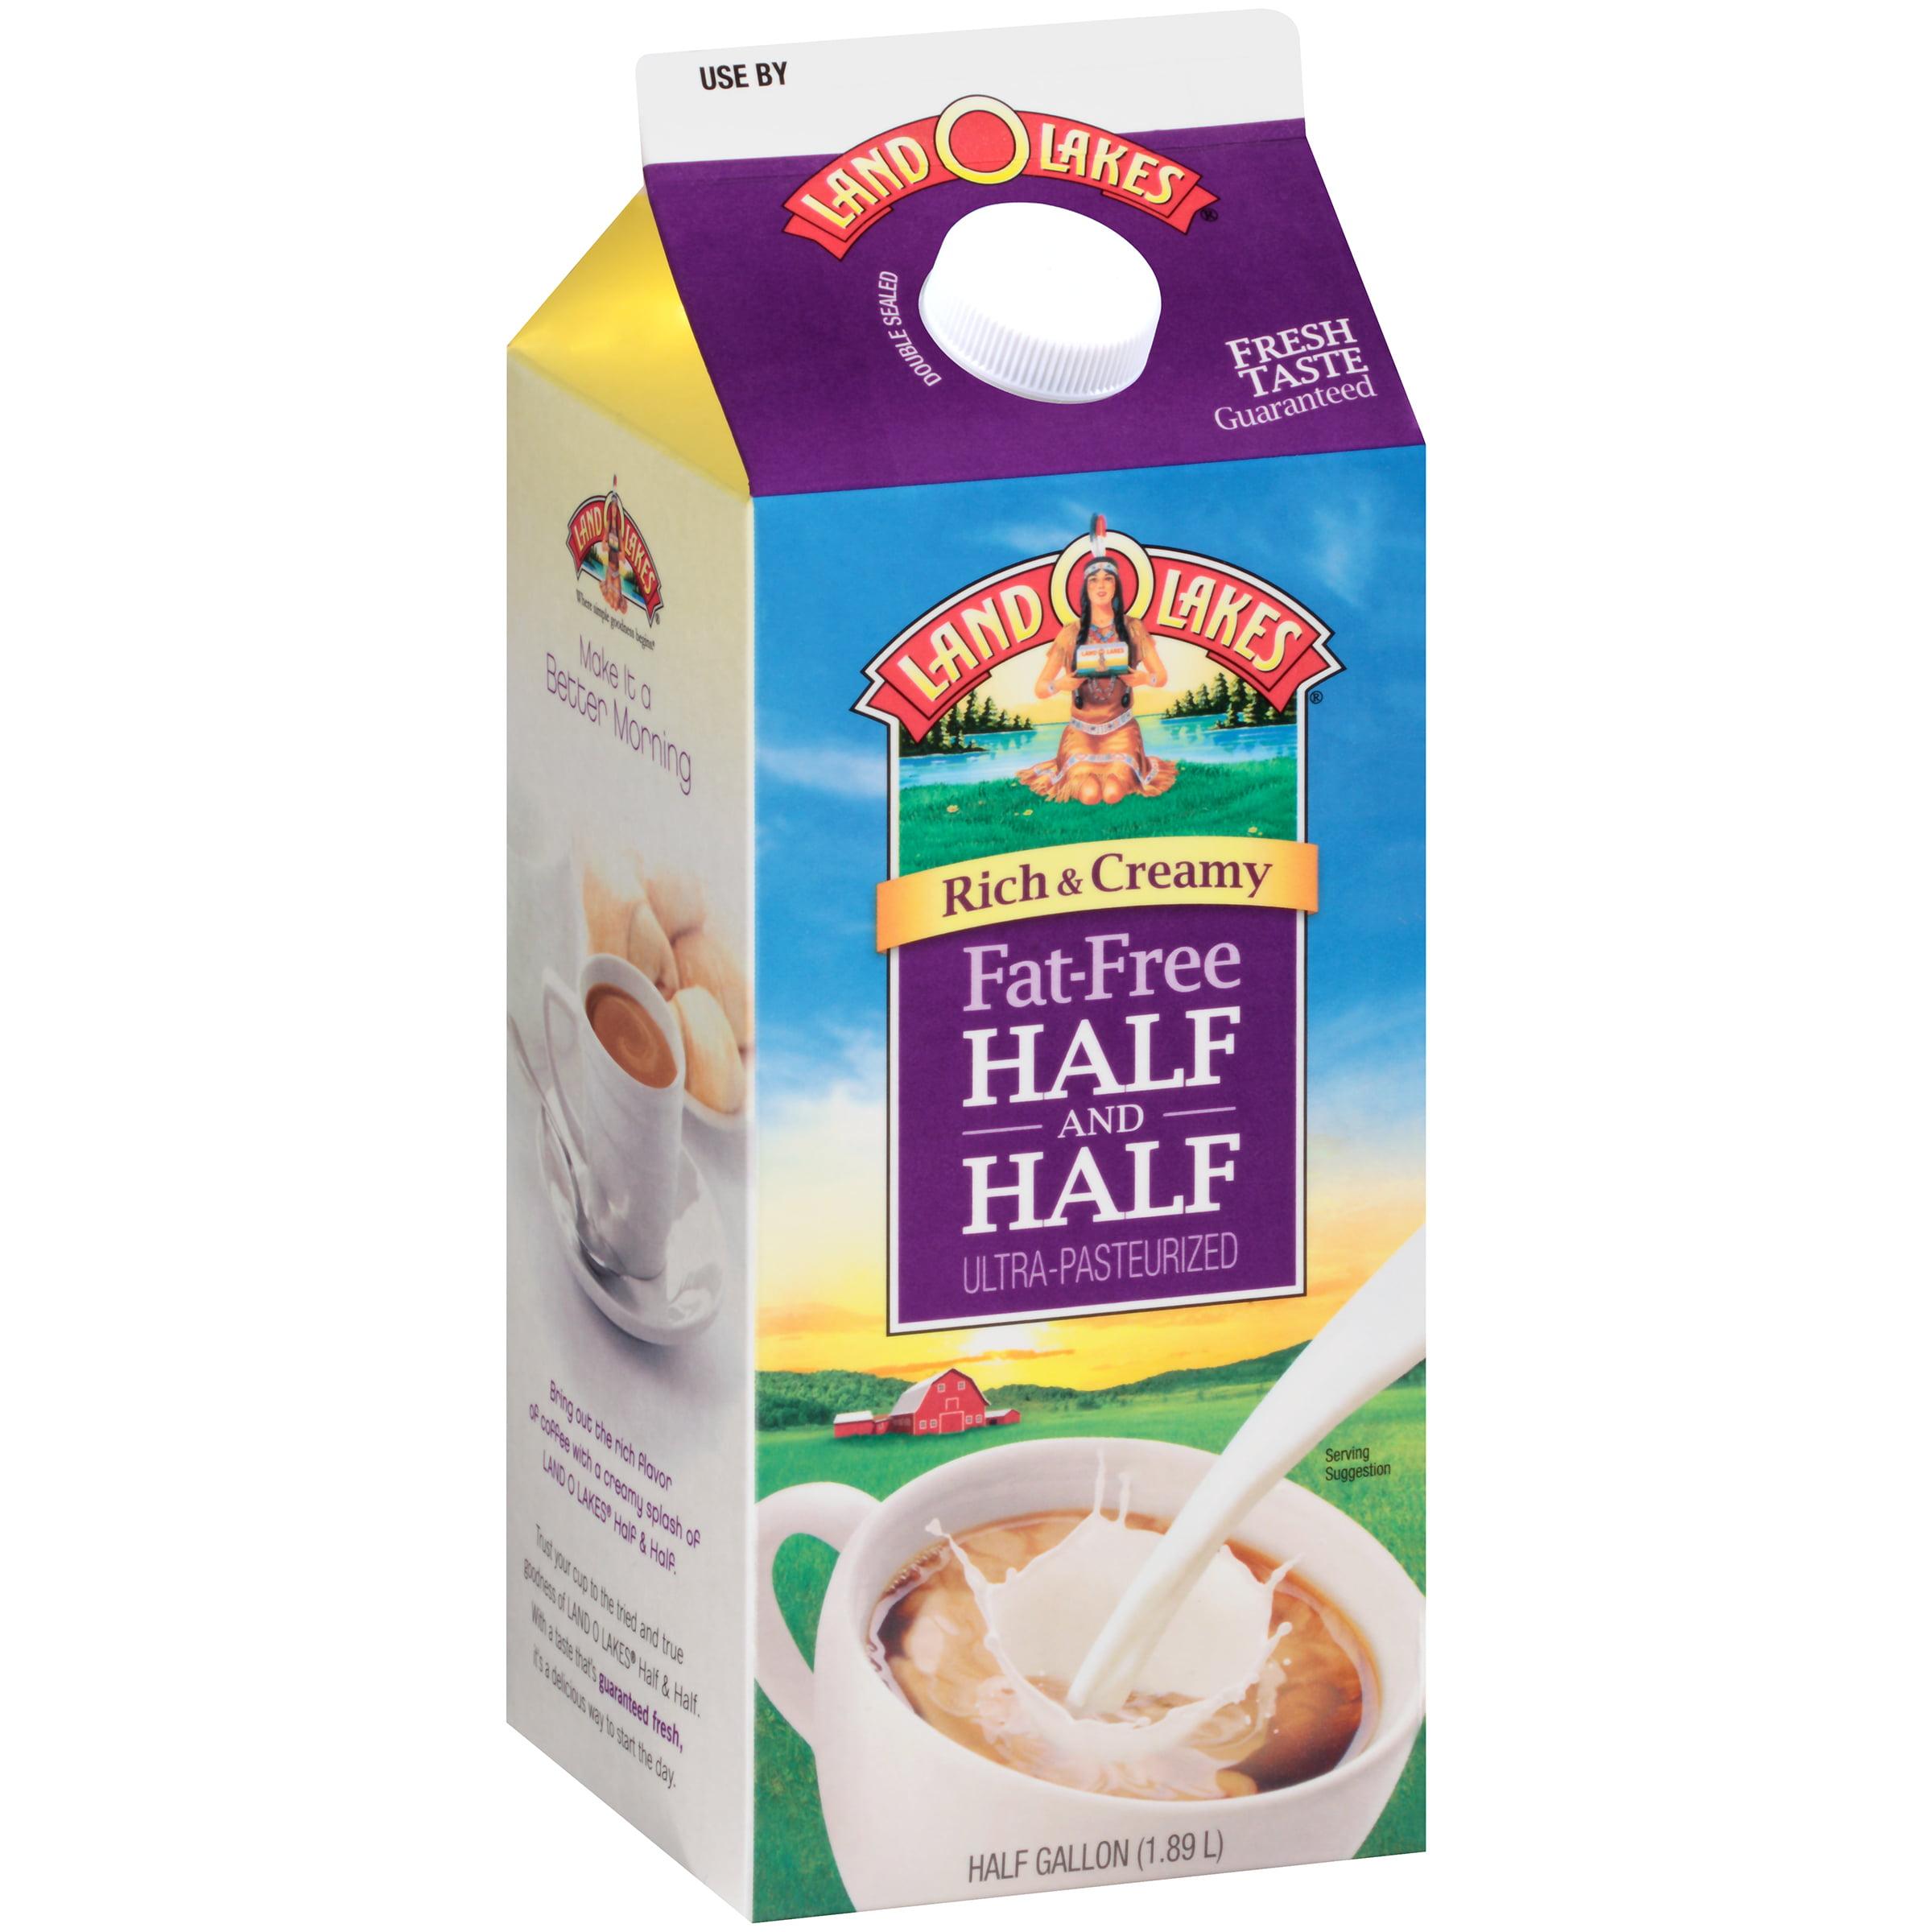 Land O Lakes�� Rich & Creamy Fat Free Ultra-Pasteurized Half and Half 0.5 gal. Carton